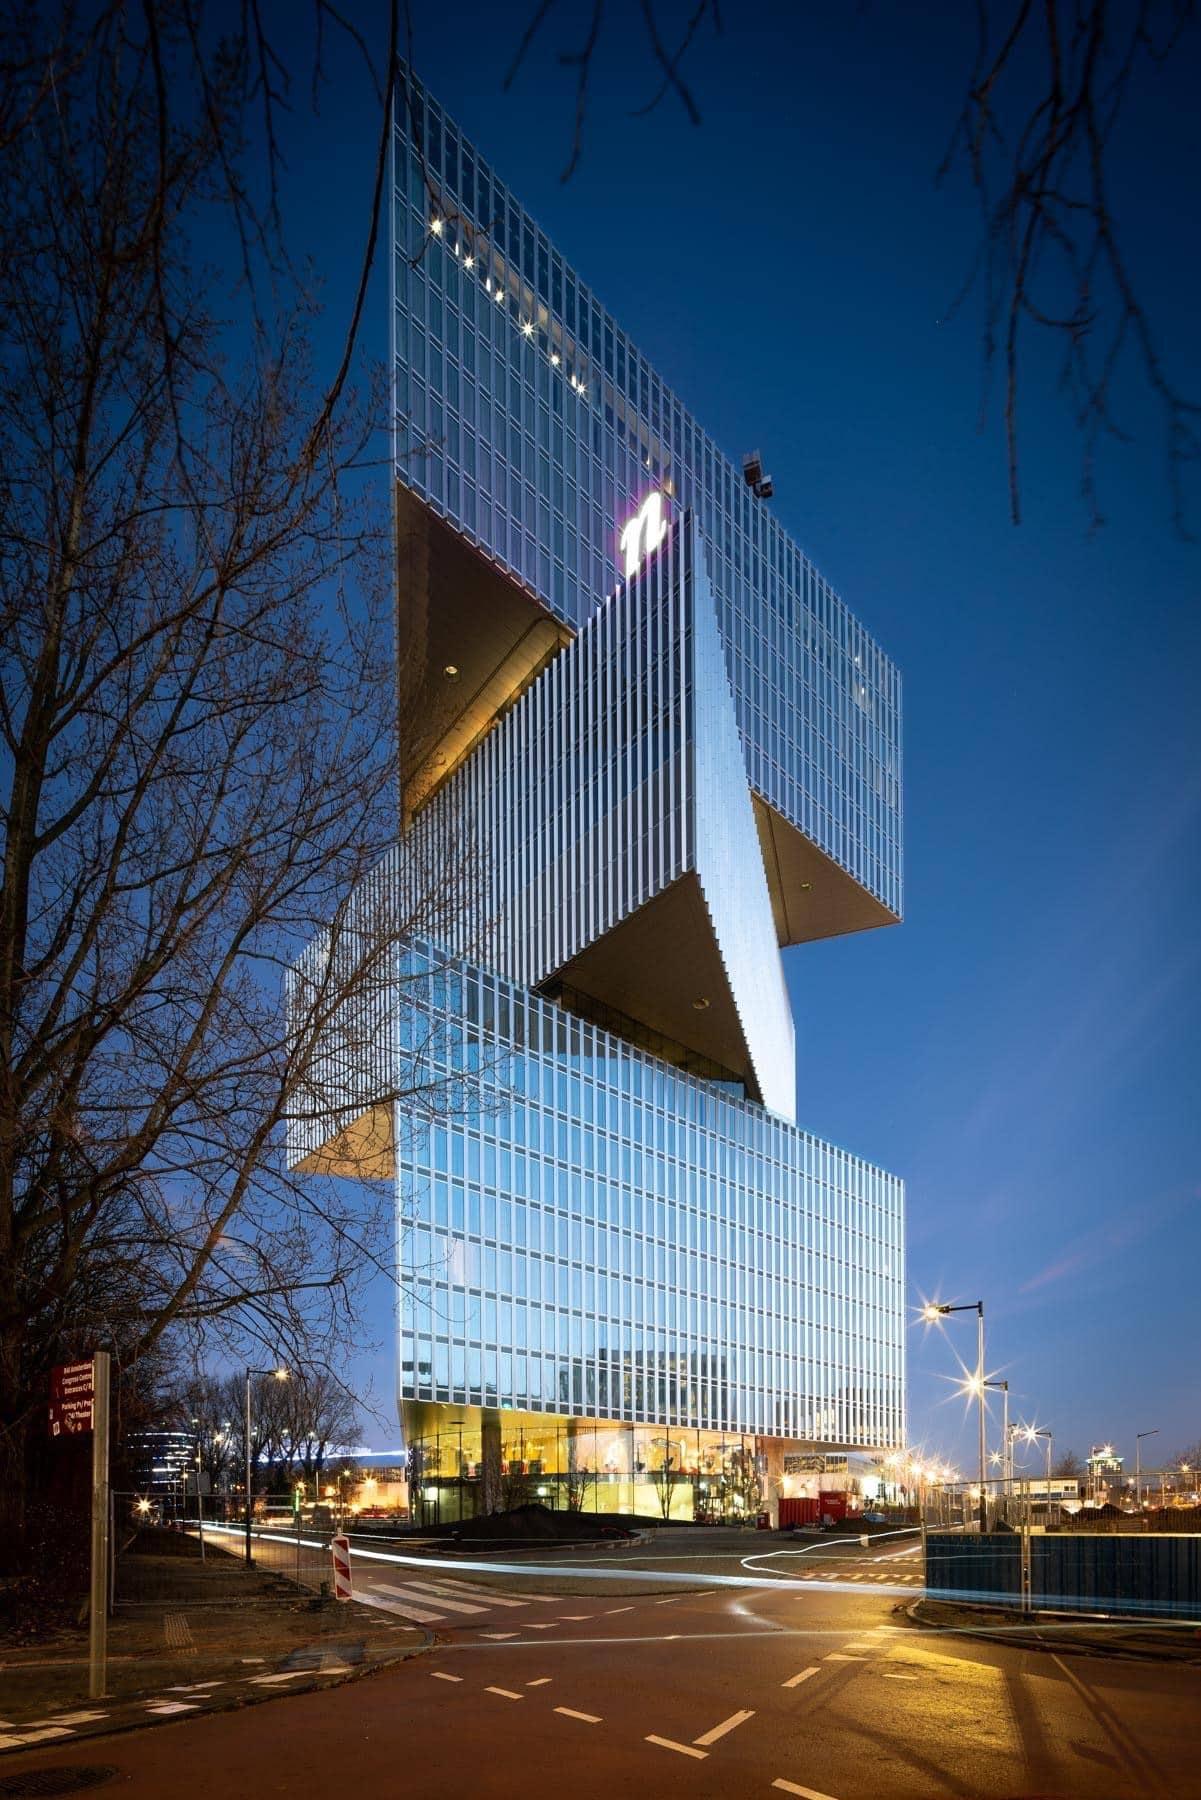 RAI NH Hotel - Amsterdam, Opdrachtgever: Rollecate